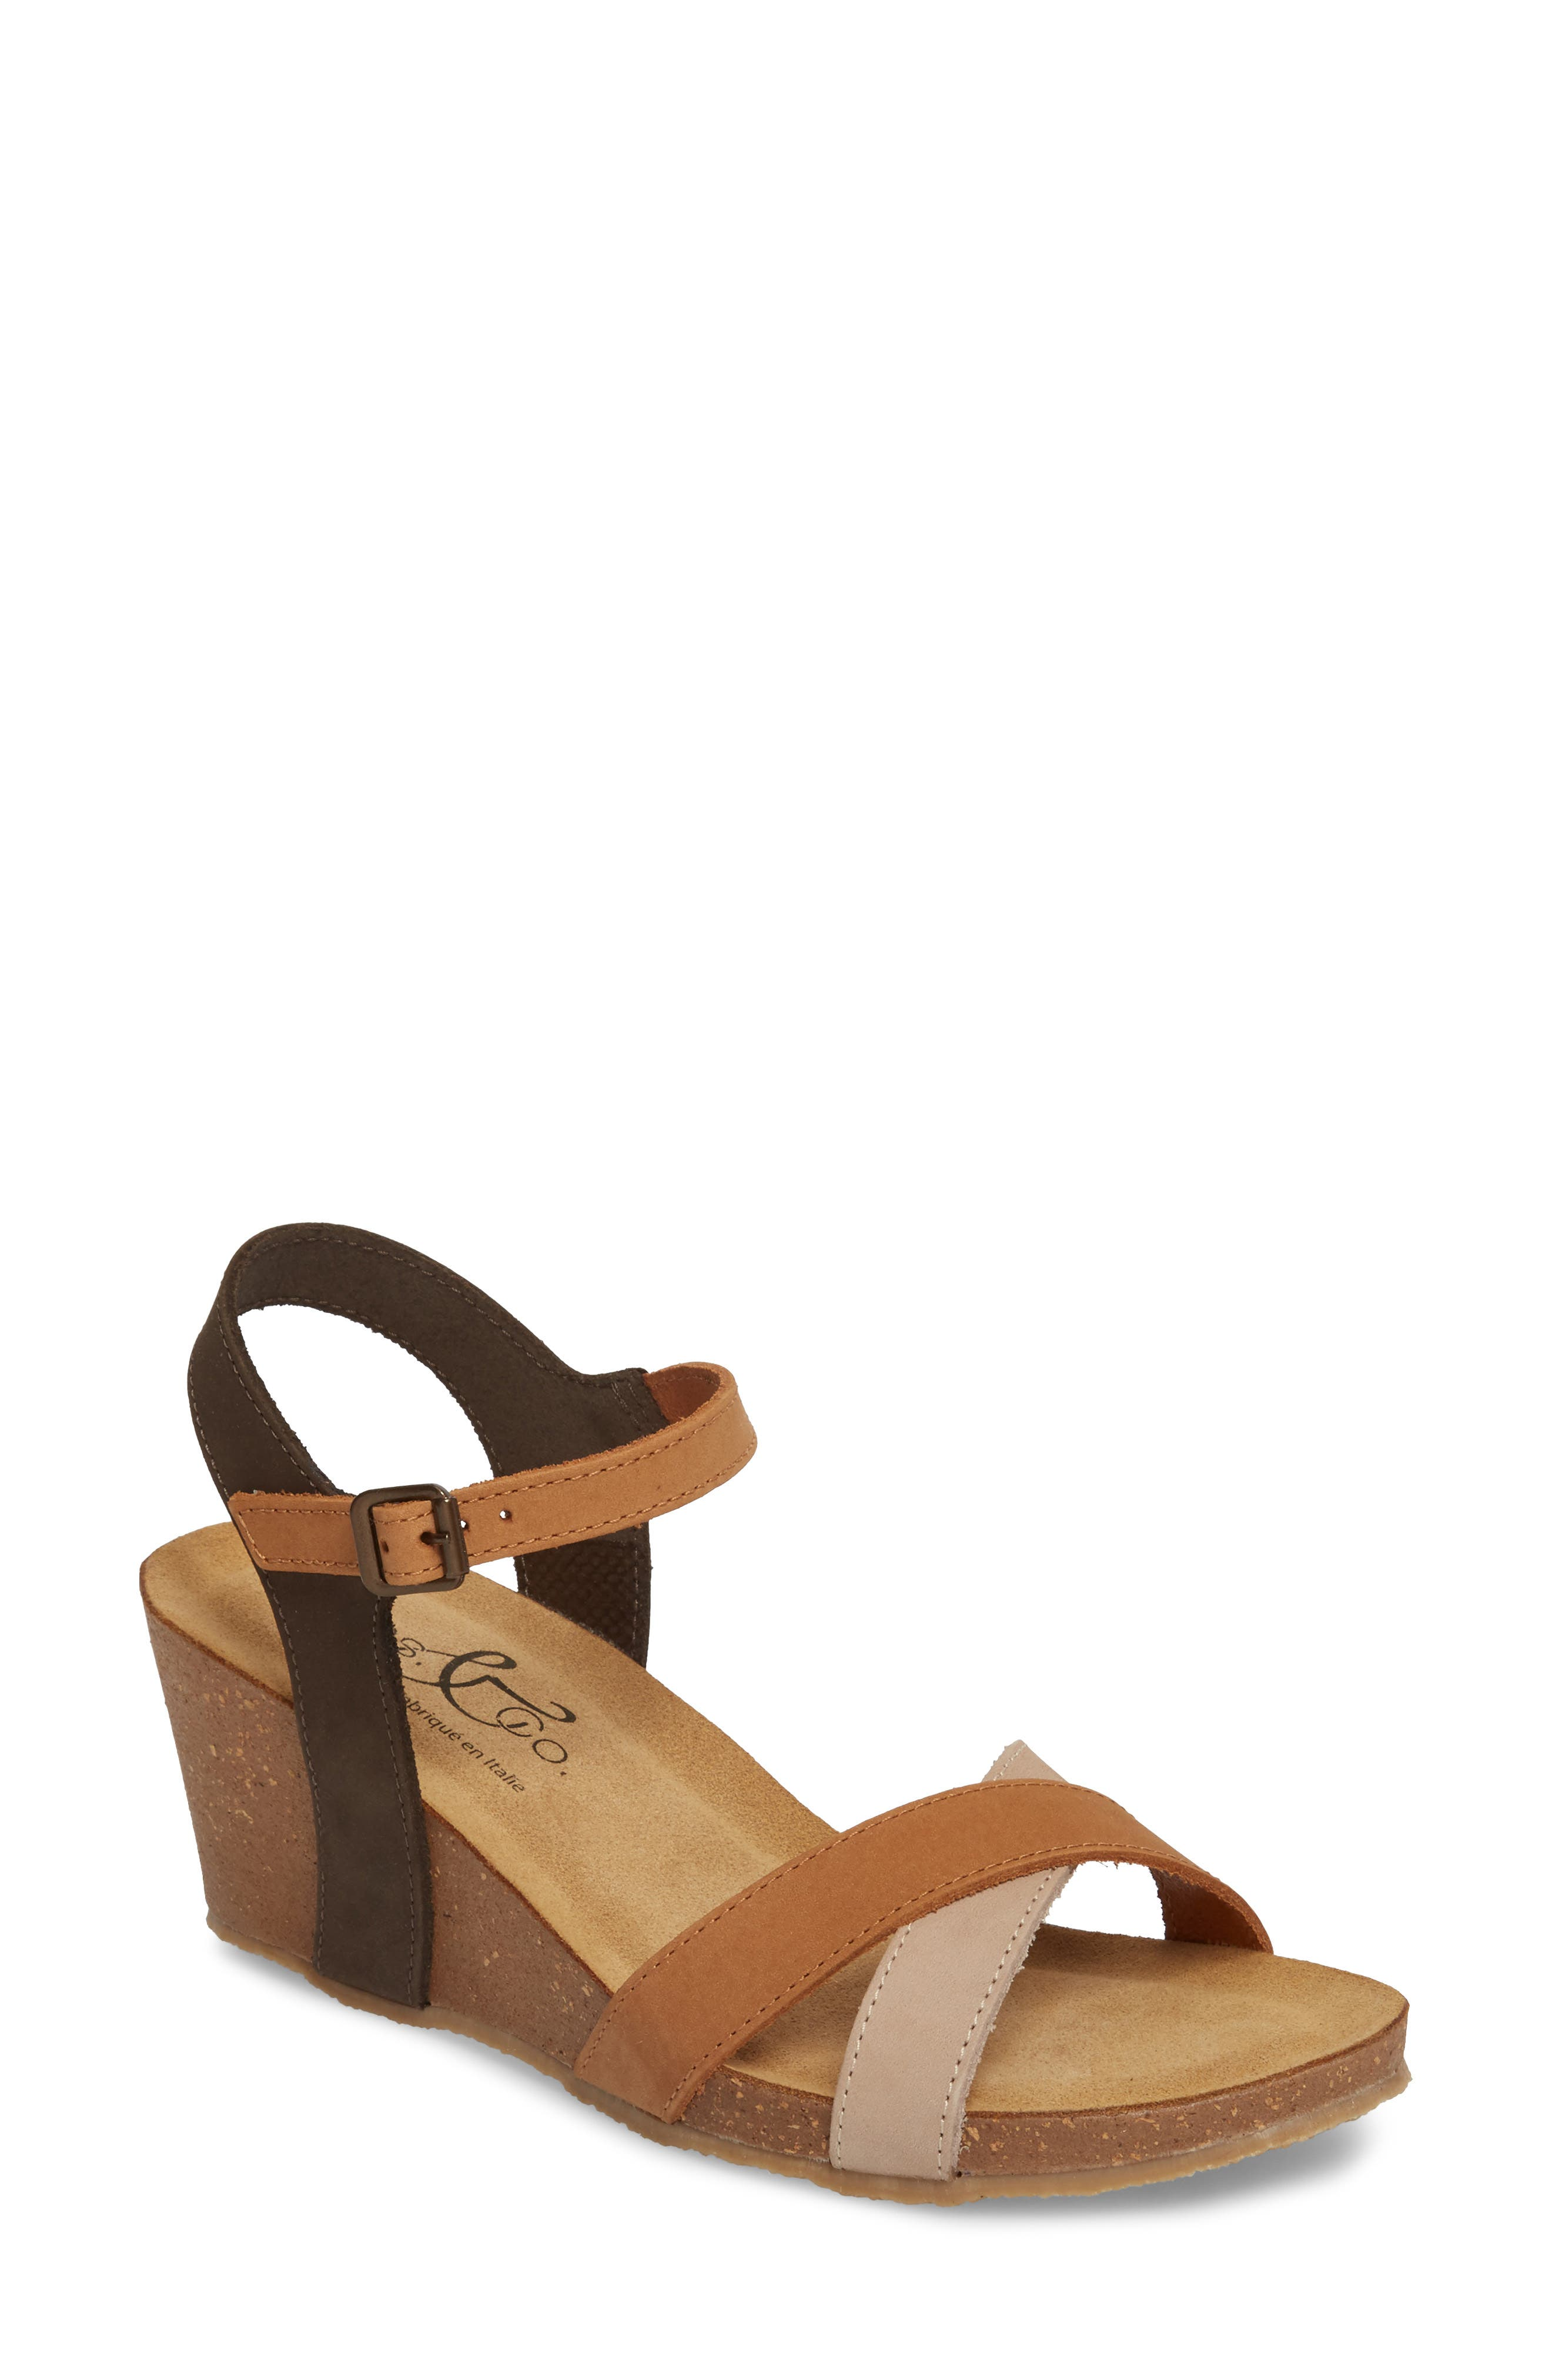 Bos. & Co. Lucca Wedge Sandal, Brown